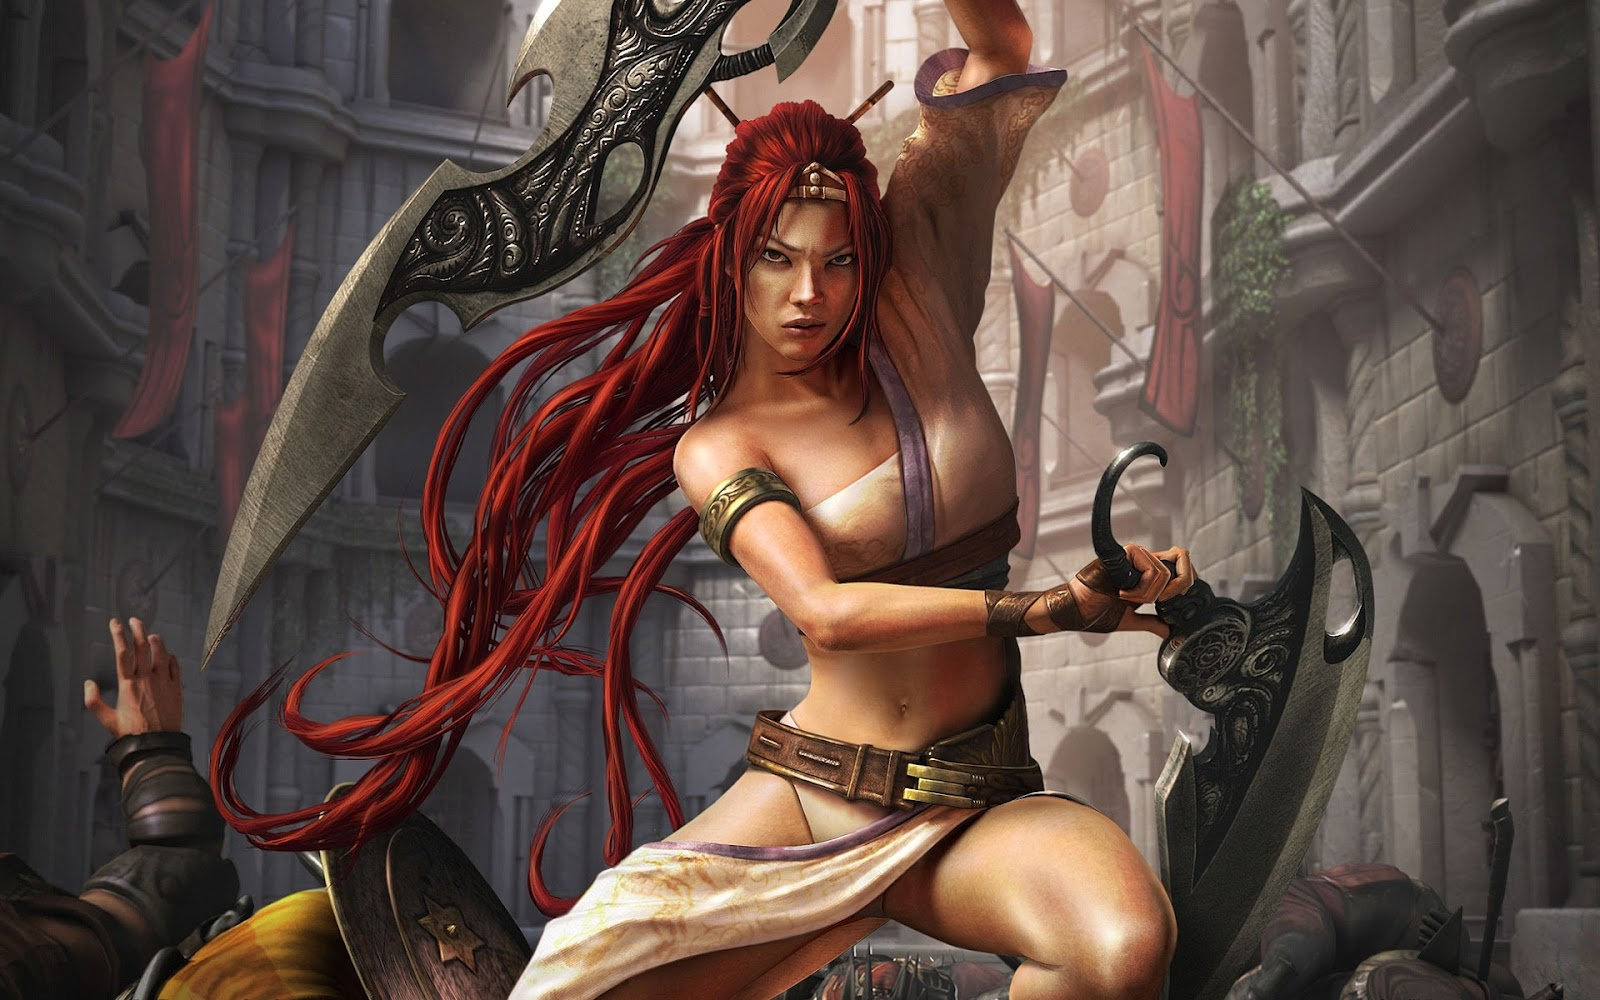 wallpapers HD Gratuit rebelle fantasy girl 2012 1600x1000